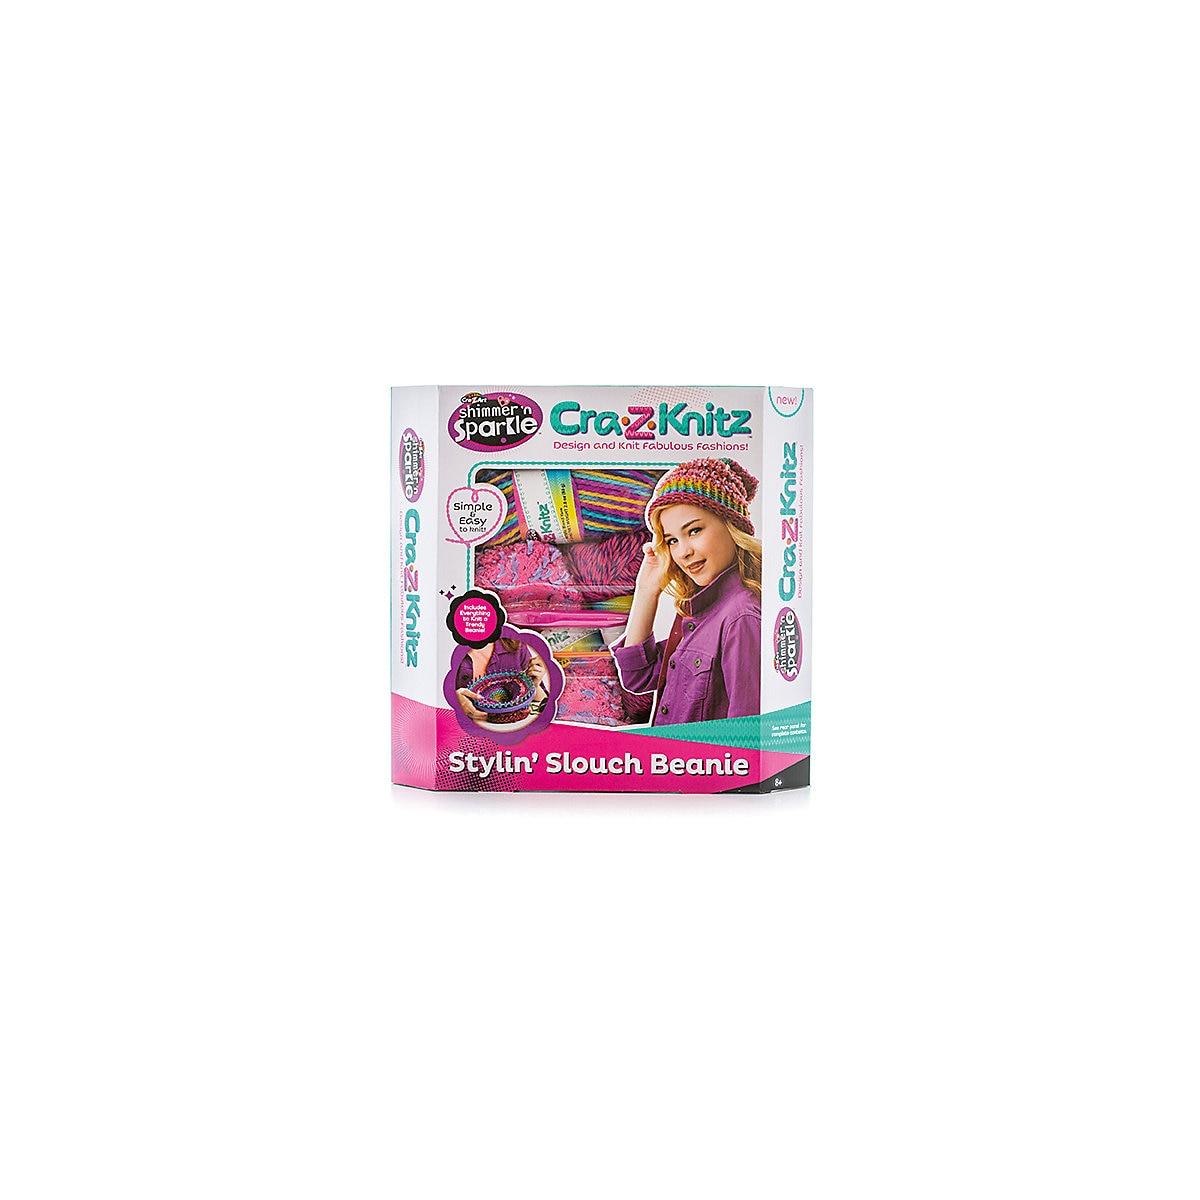 SPIN MASTER Craft Toys 5103467 Sets For Creativity Girls Boys Arts & Crafts Kids Handcraft Baby Toy MTpromo